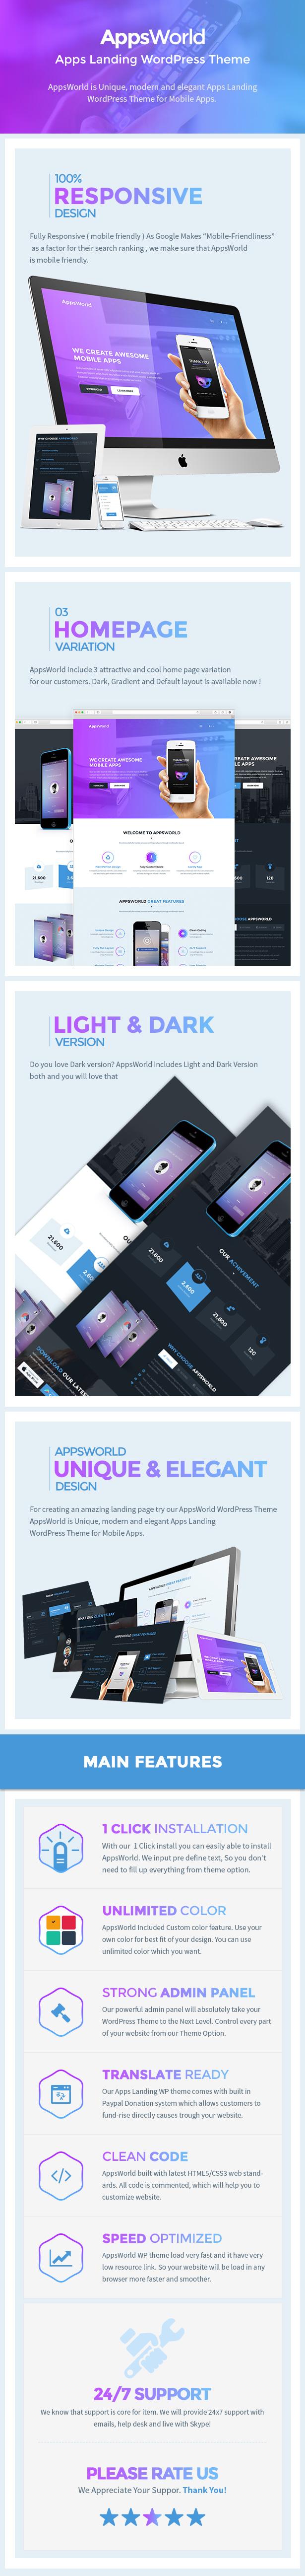 AppsWorld - App Landing Page Theme